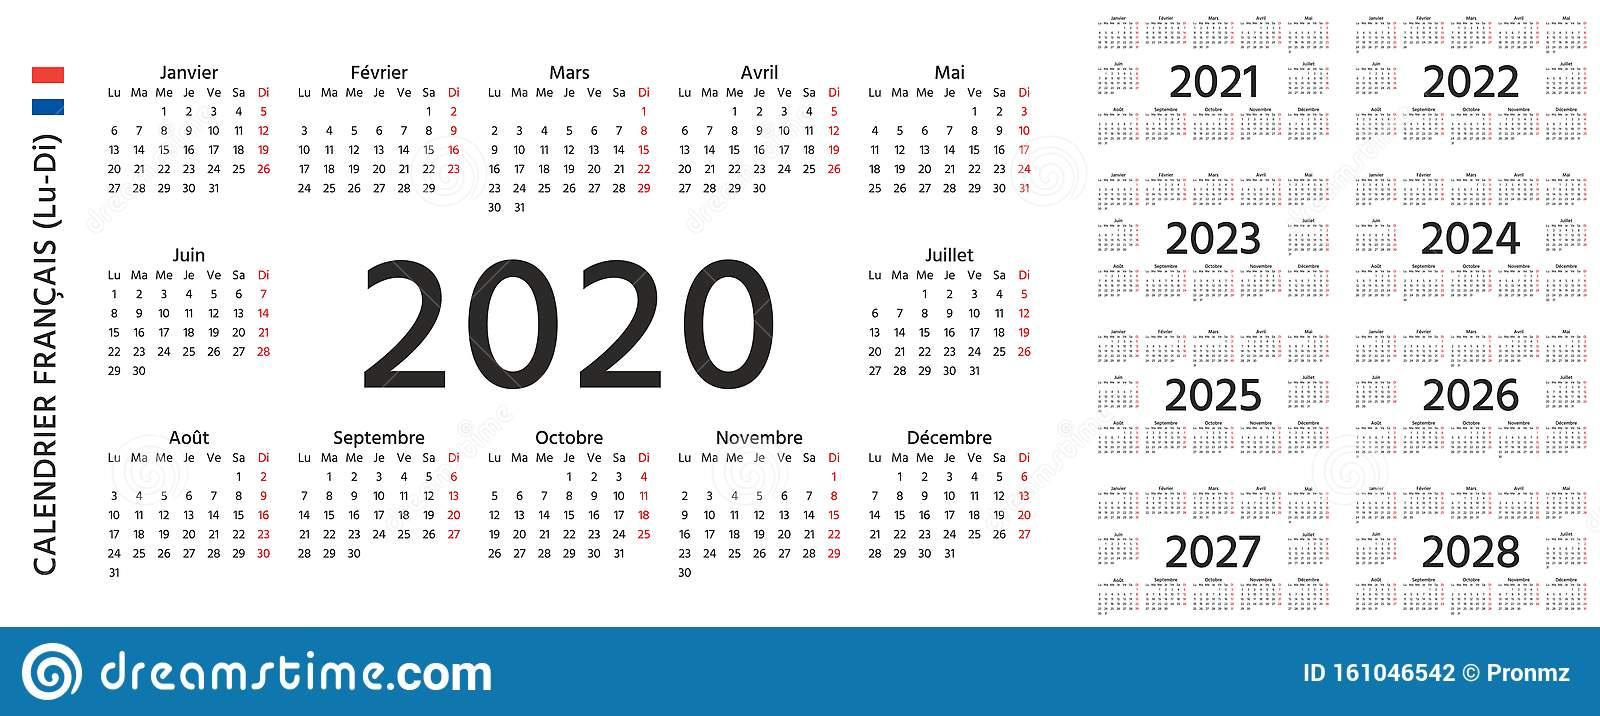 2020 2021 2022 French Calendar. Vector Illustration